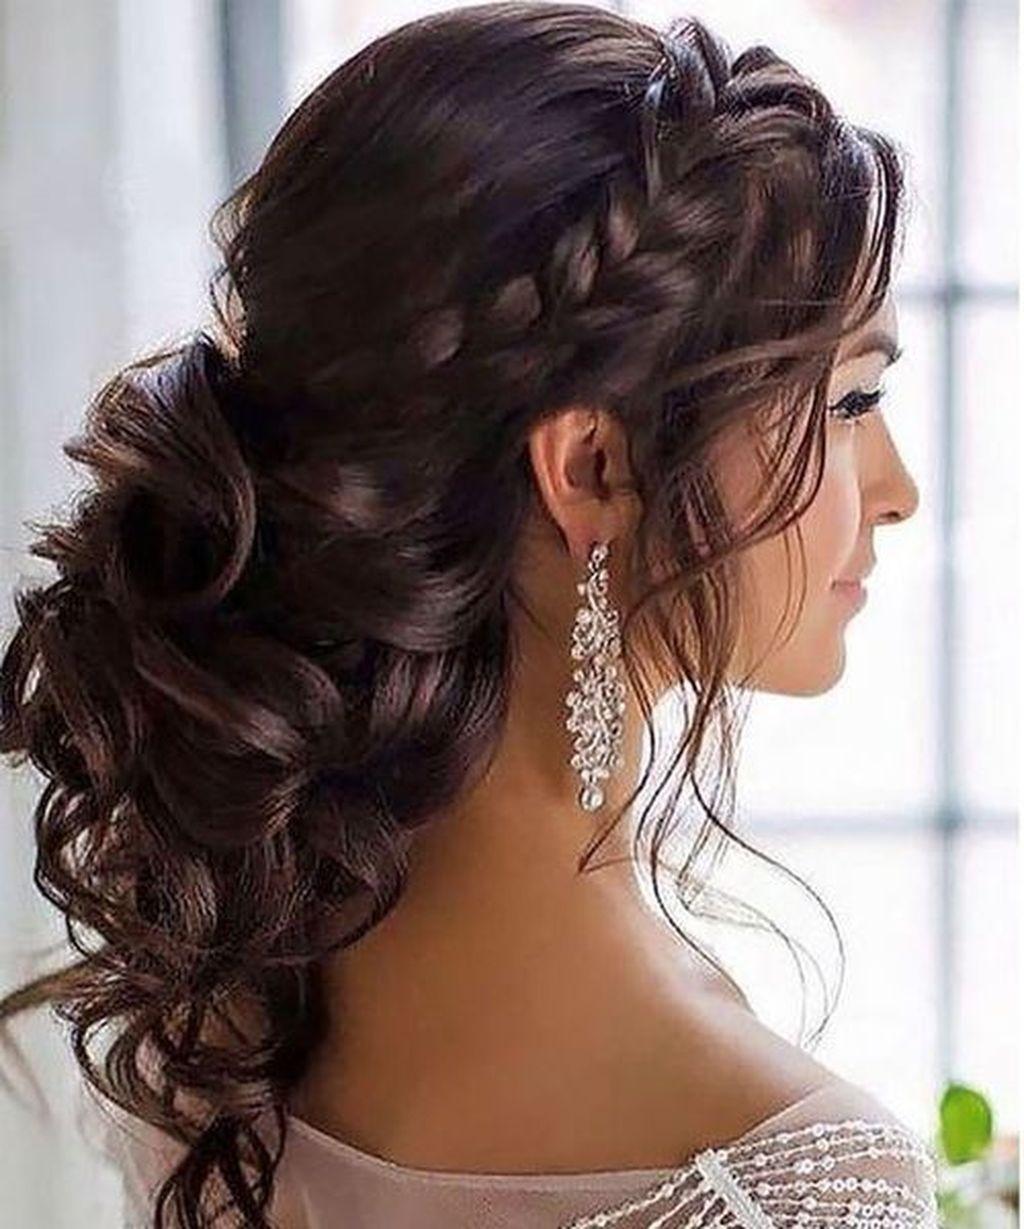 Pin by Wedding Hairstyles on Wedding Hairstyles | Hairdo ...